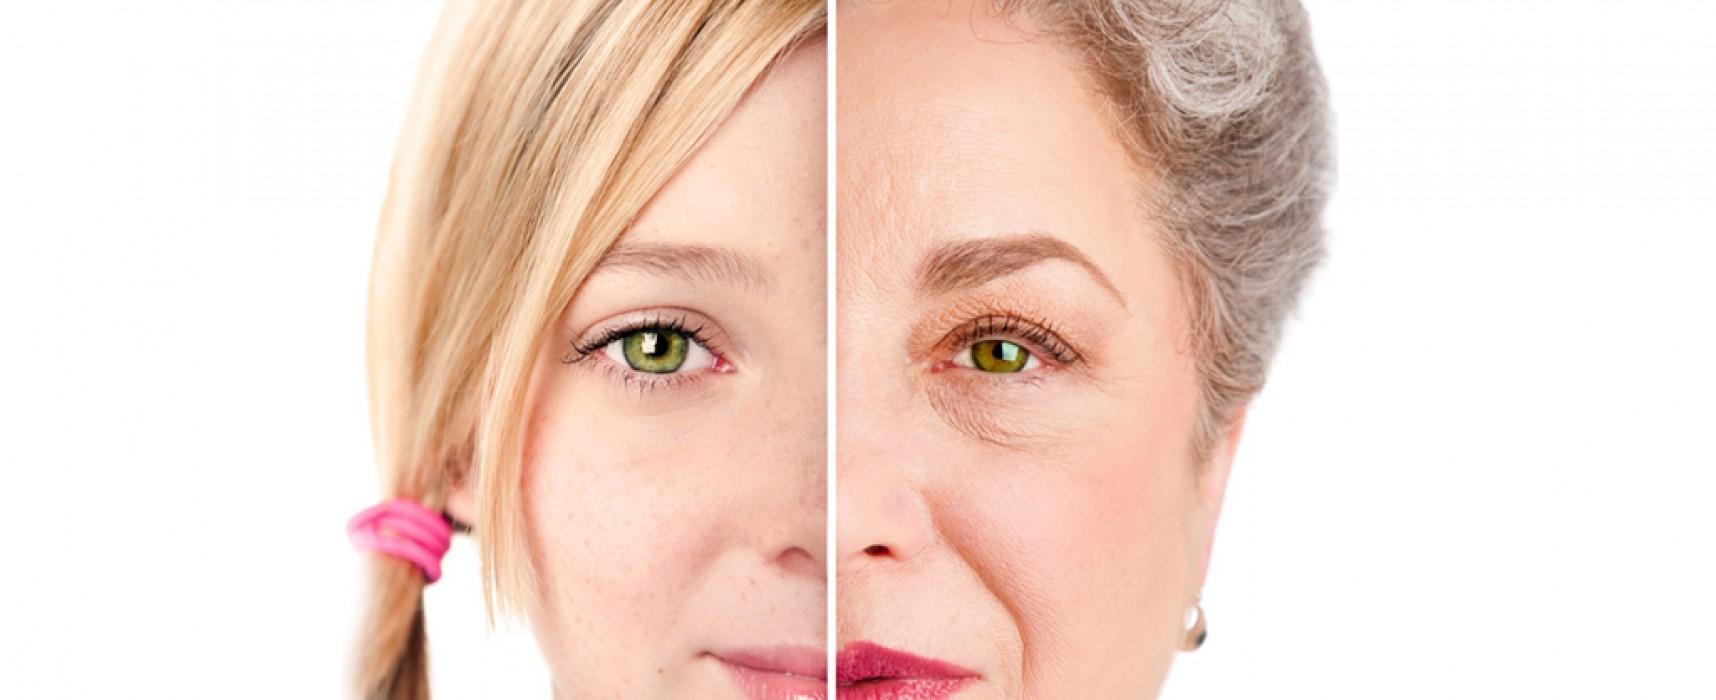 Старение. Как тело стареет